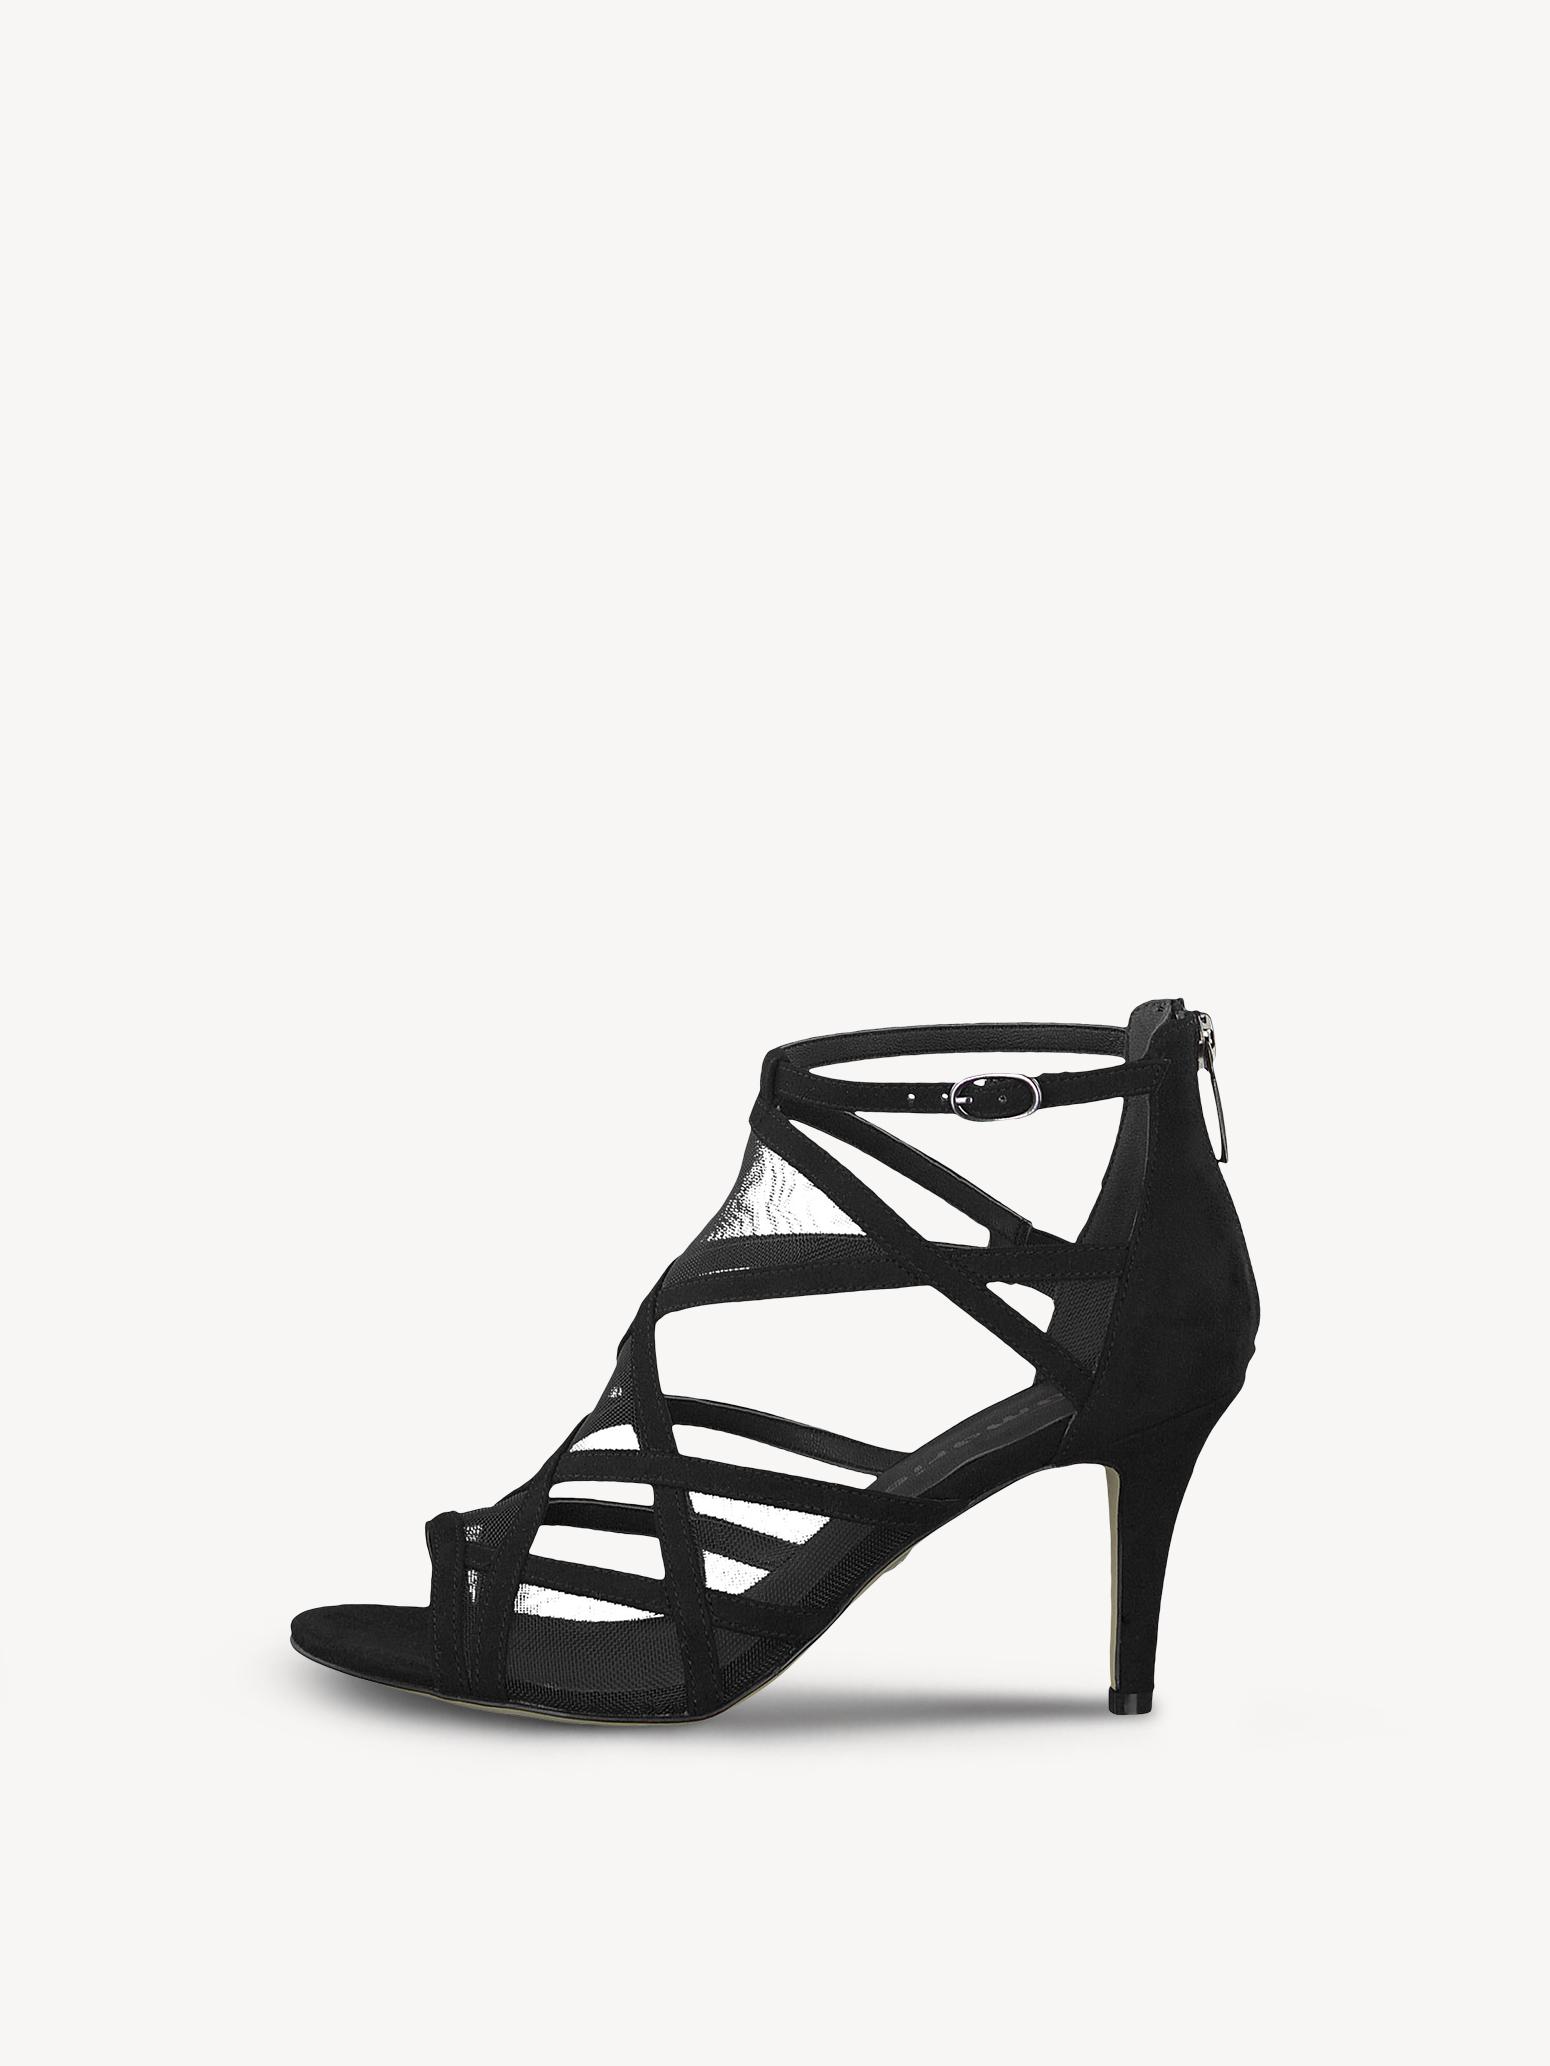 Tamaris Ballerina 29406 Damen Pumps Slingpumps 515 Schuhe 1